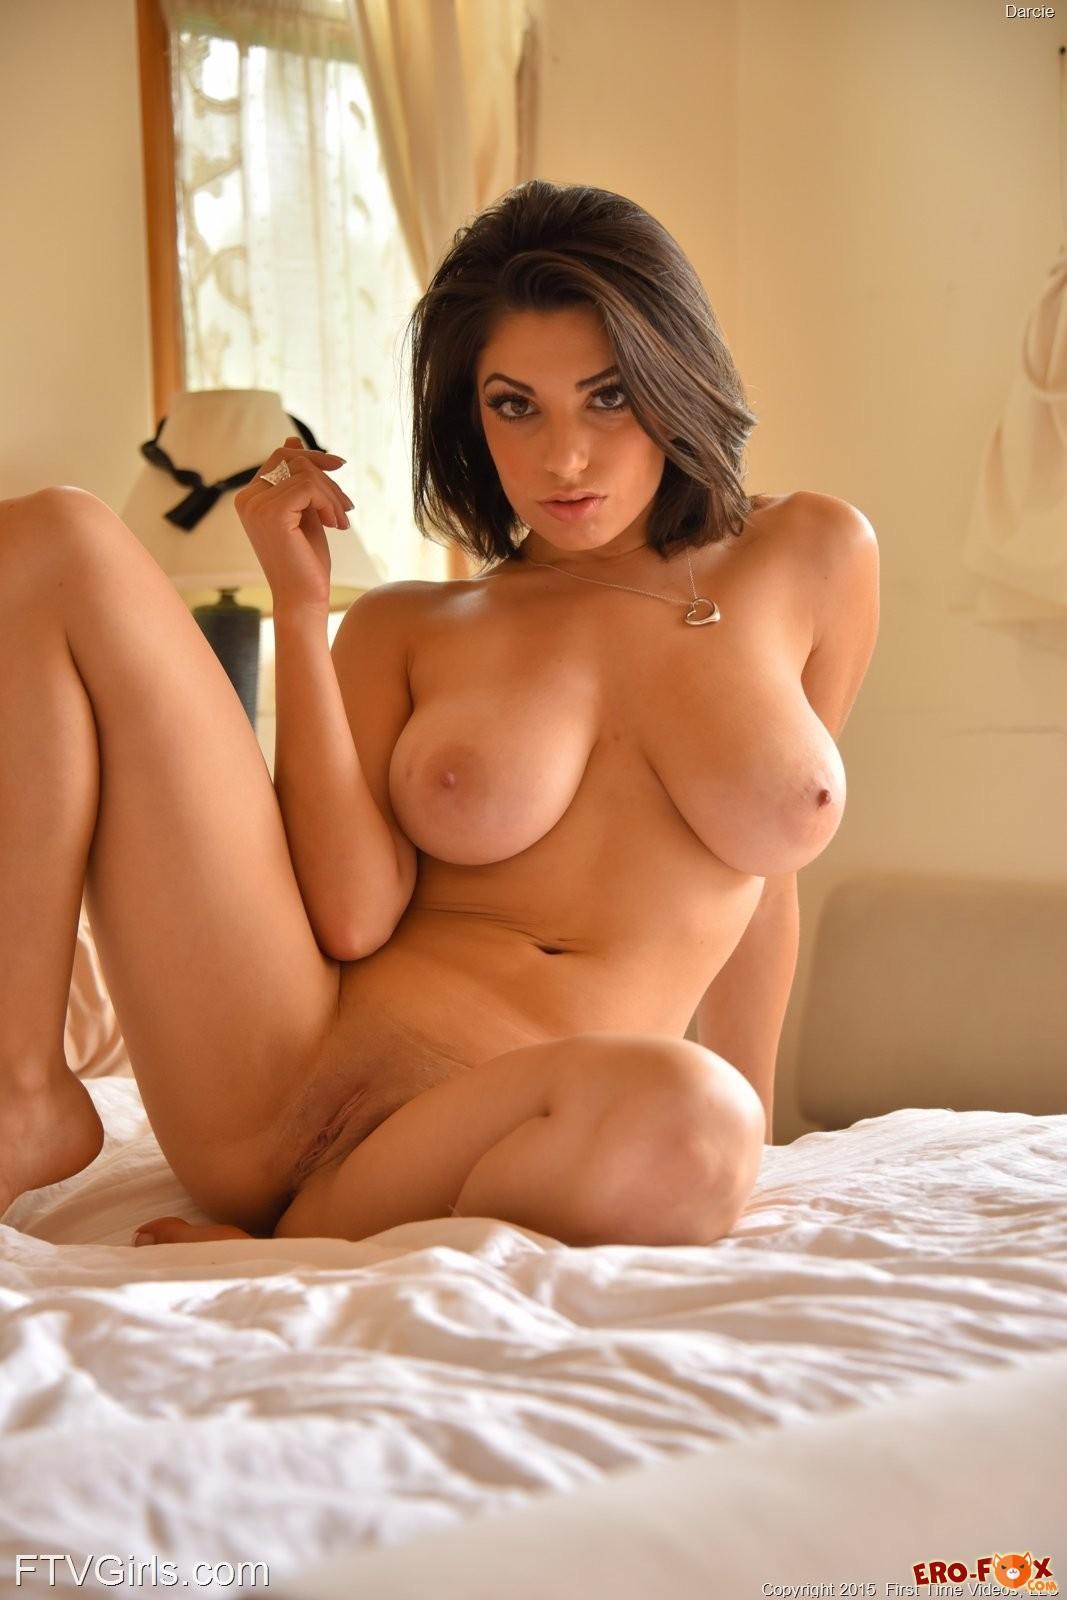 Nice Big Sexy Tits